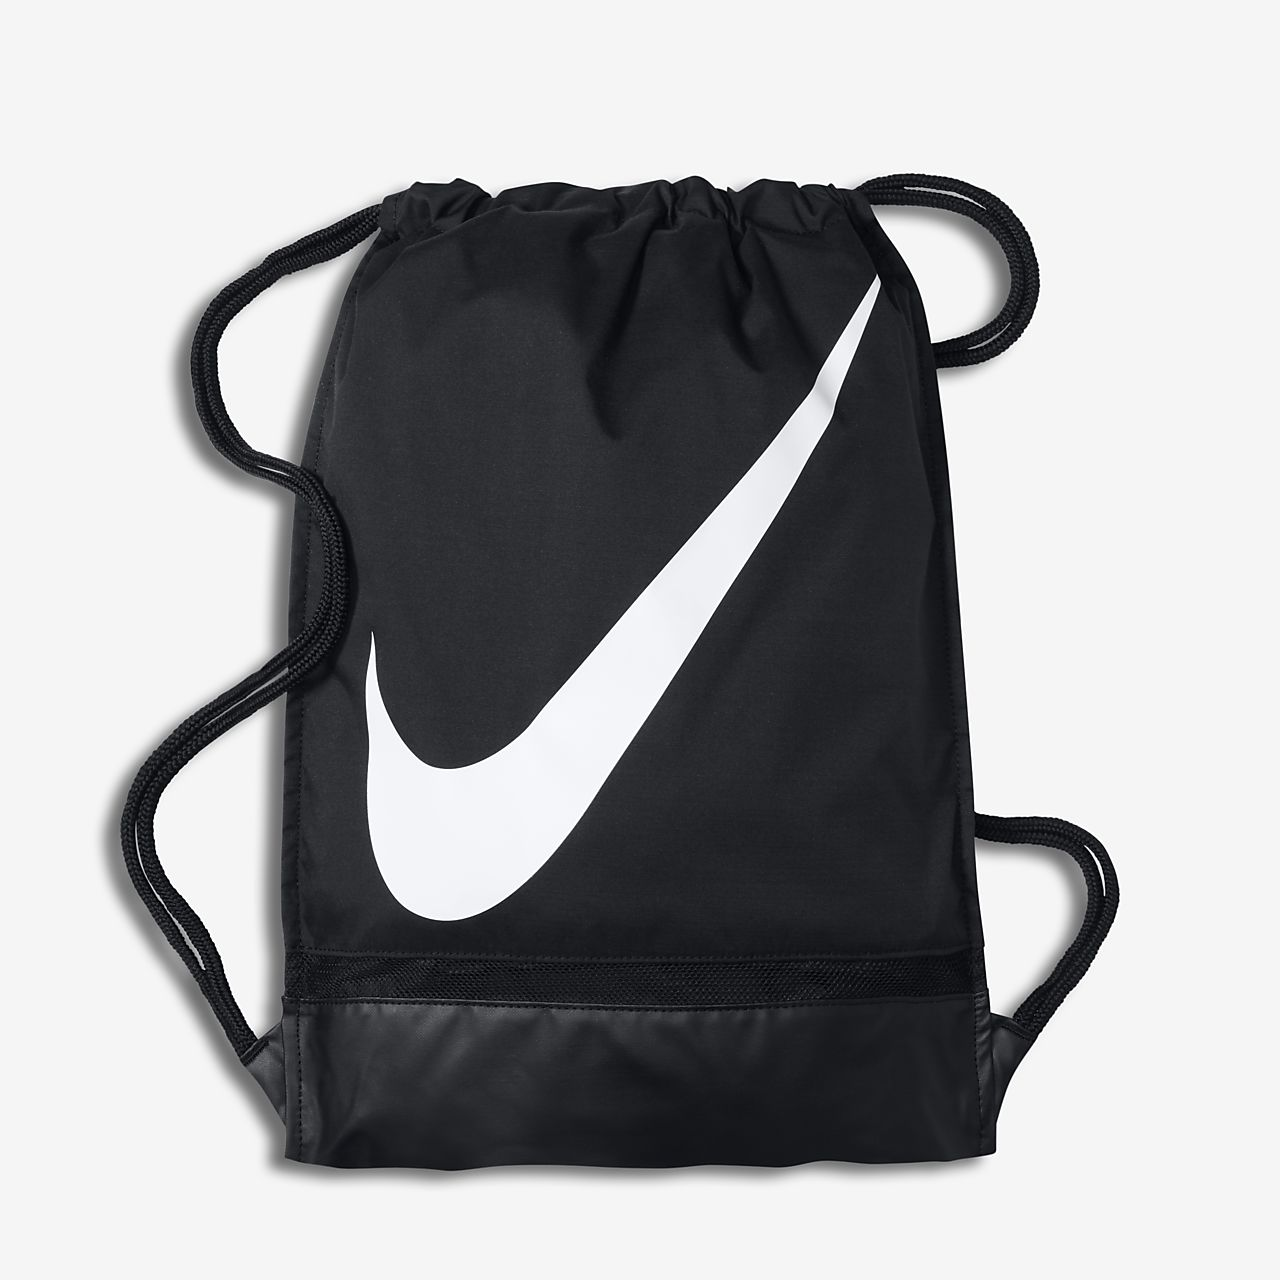 Nike De De FútbolEs Gimnasia Nike Saco FútbolEs Saco Gimnasia R34Aj5Lq